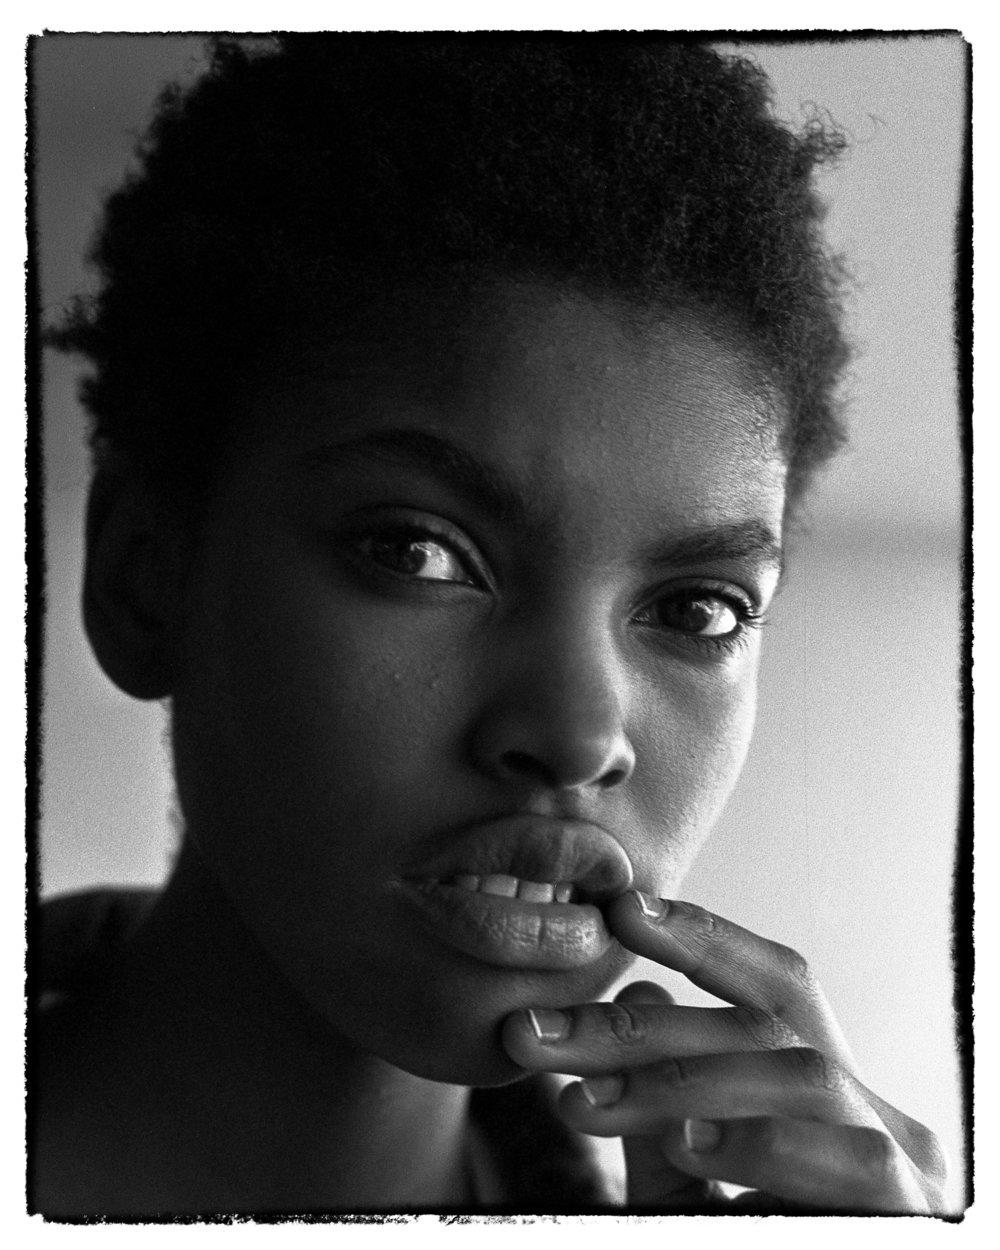 """Amilna"" by Freddie L. Rankin II / Photo Courtesy of FLRS Global"